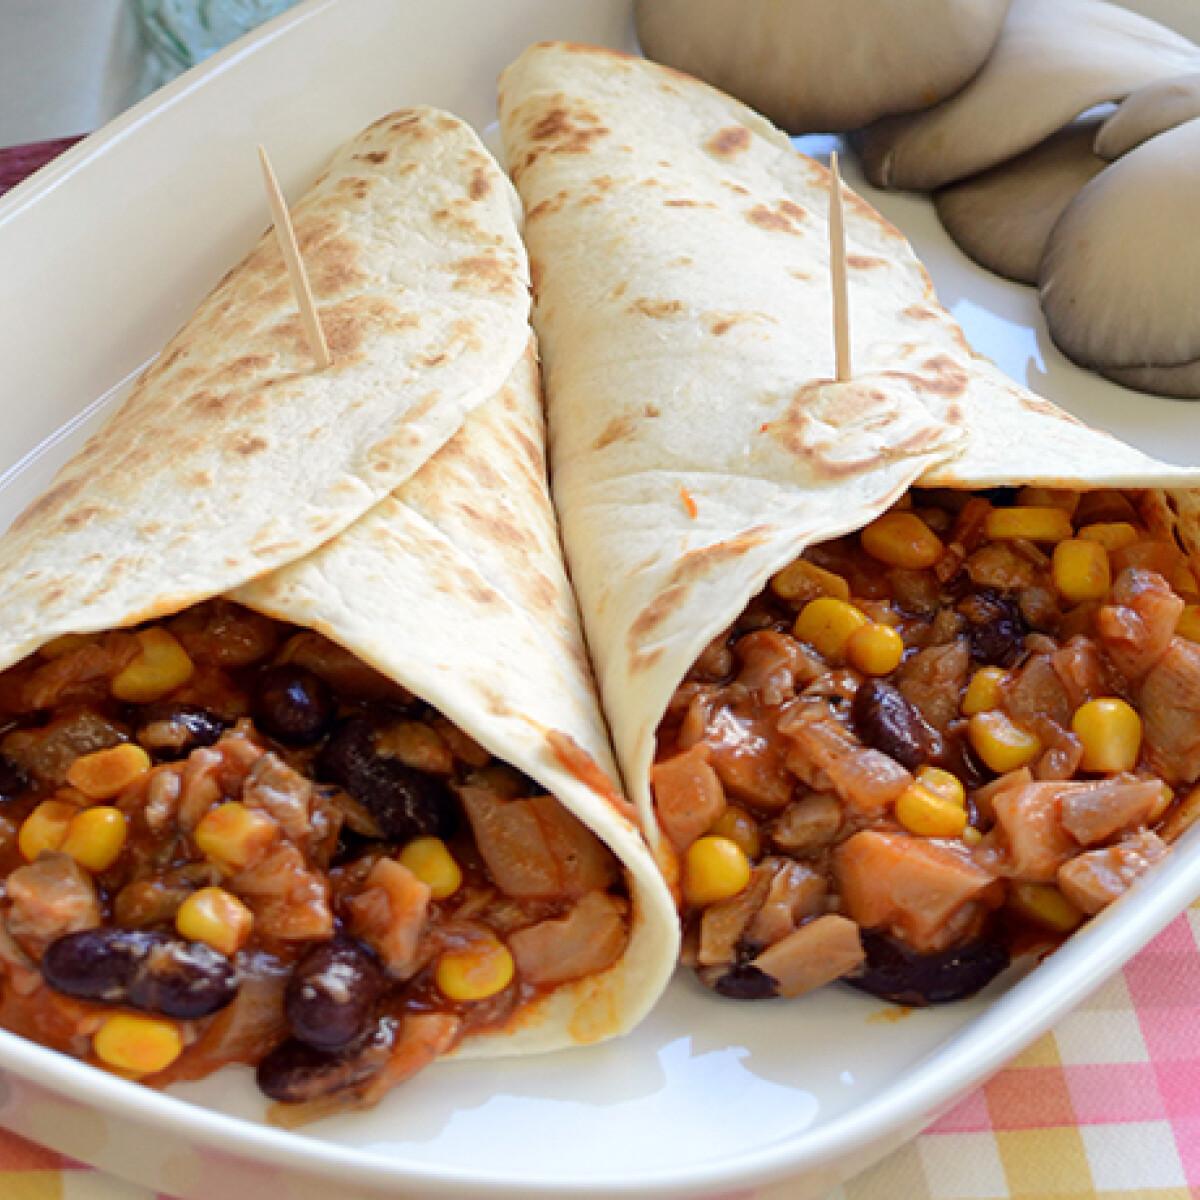 Vega chilis bab tacoba töltve